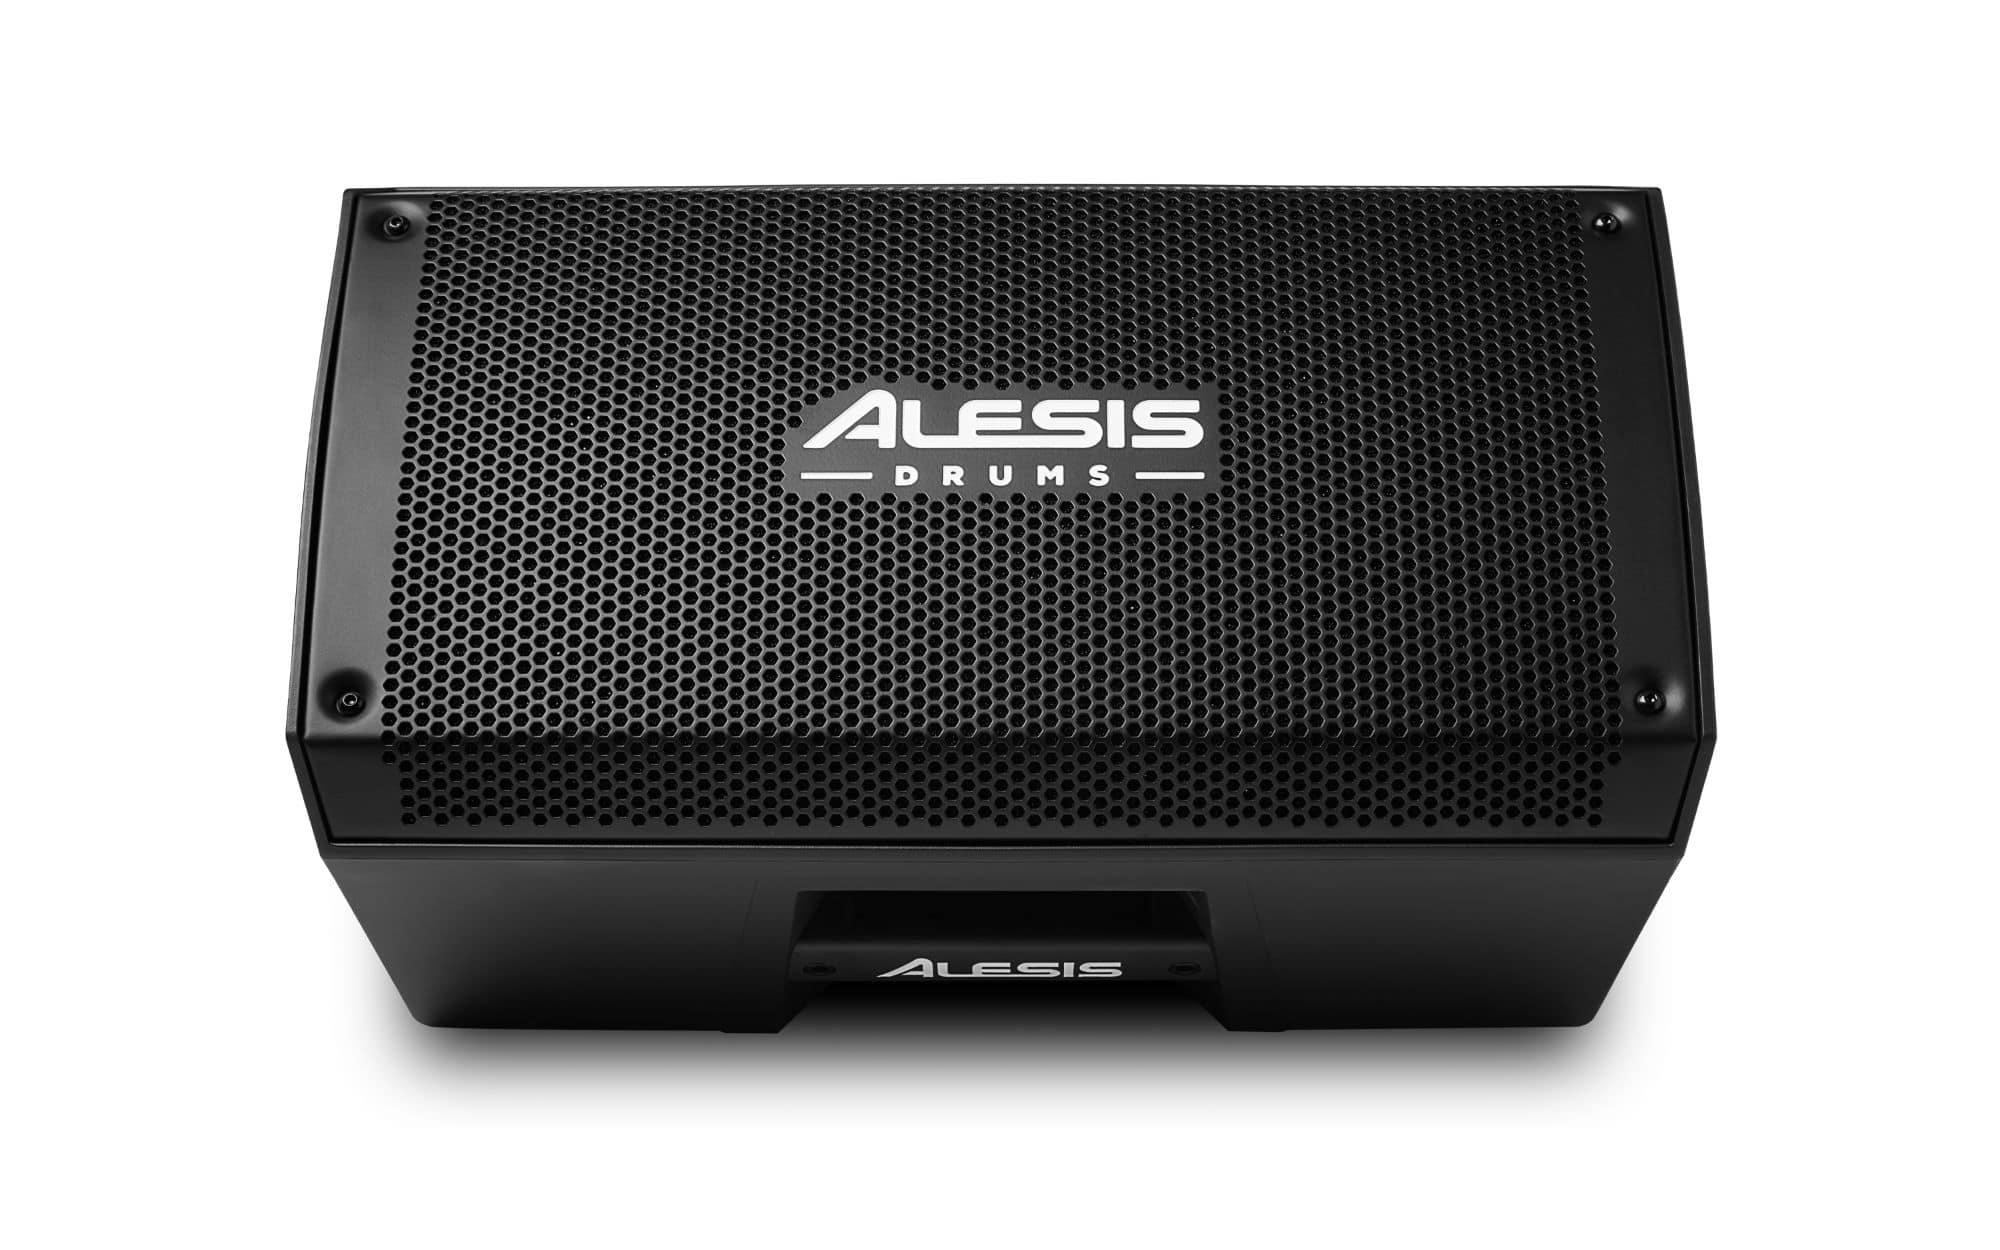 Edrummonitore - Alesis Strike AMP 8 - Onlineshop Musikhaus Kirstein